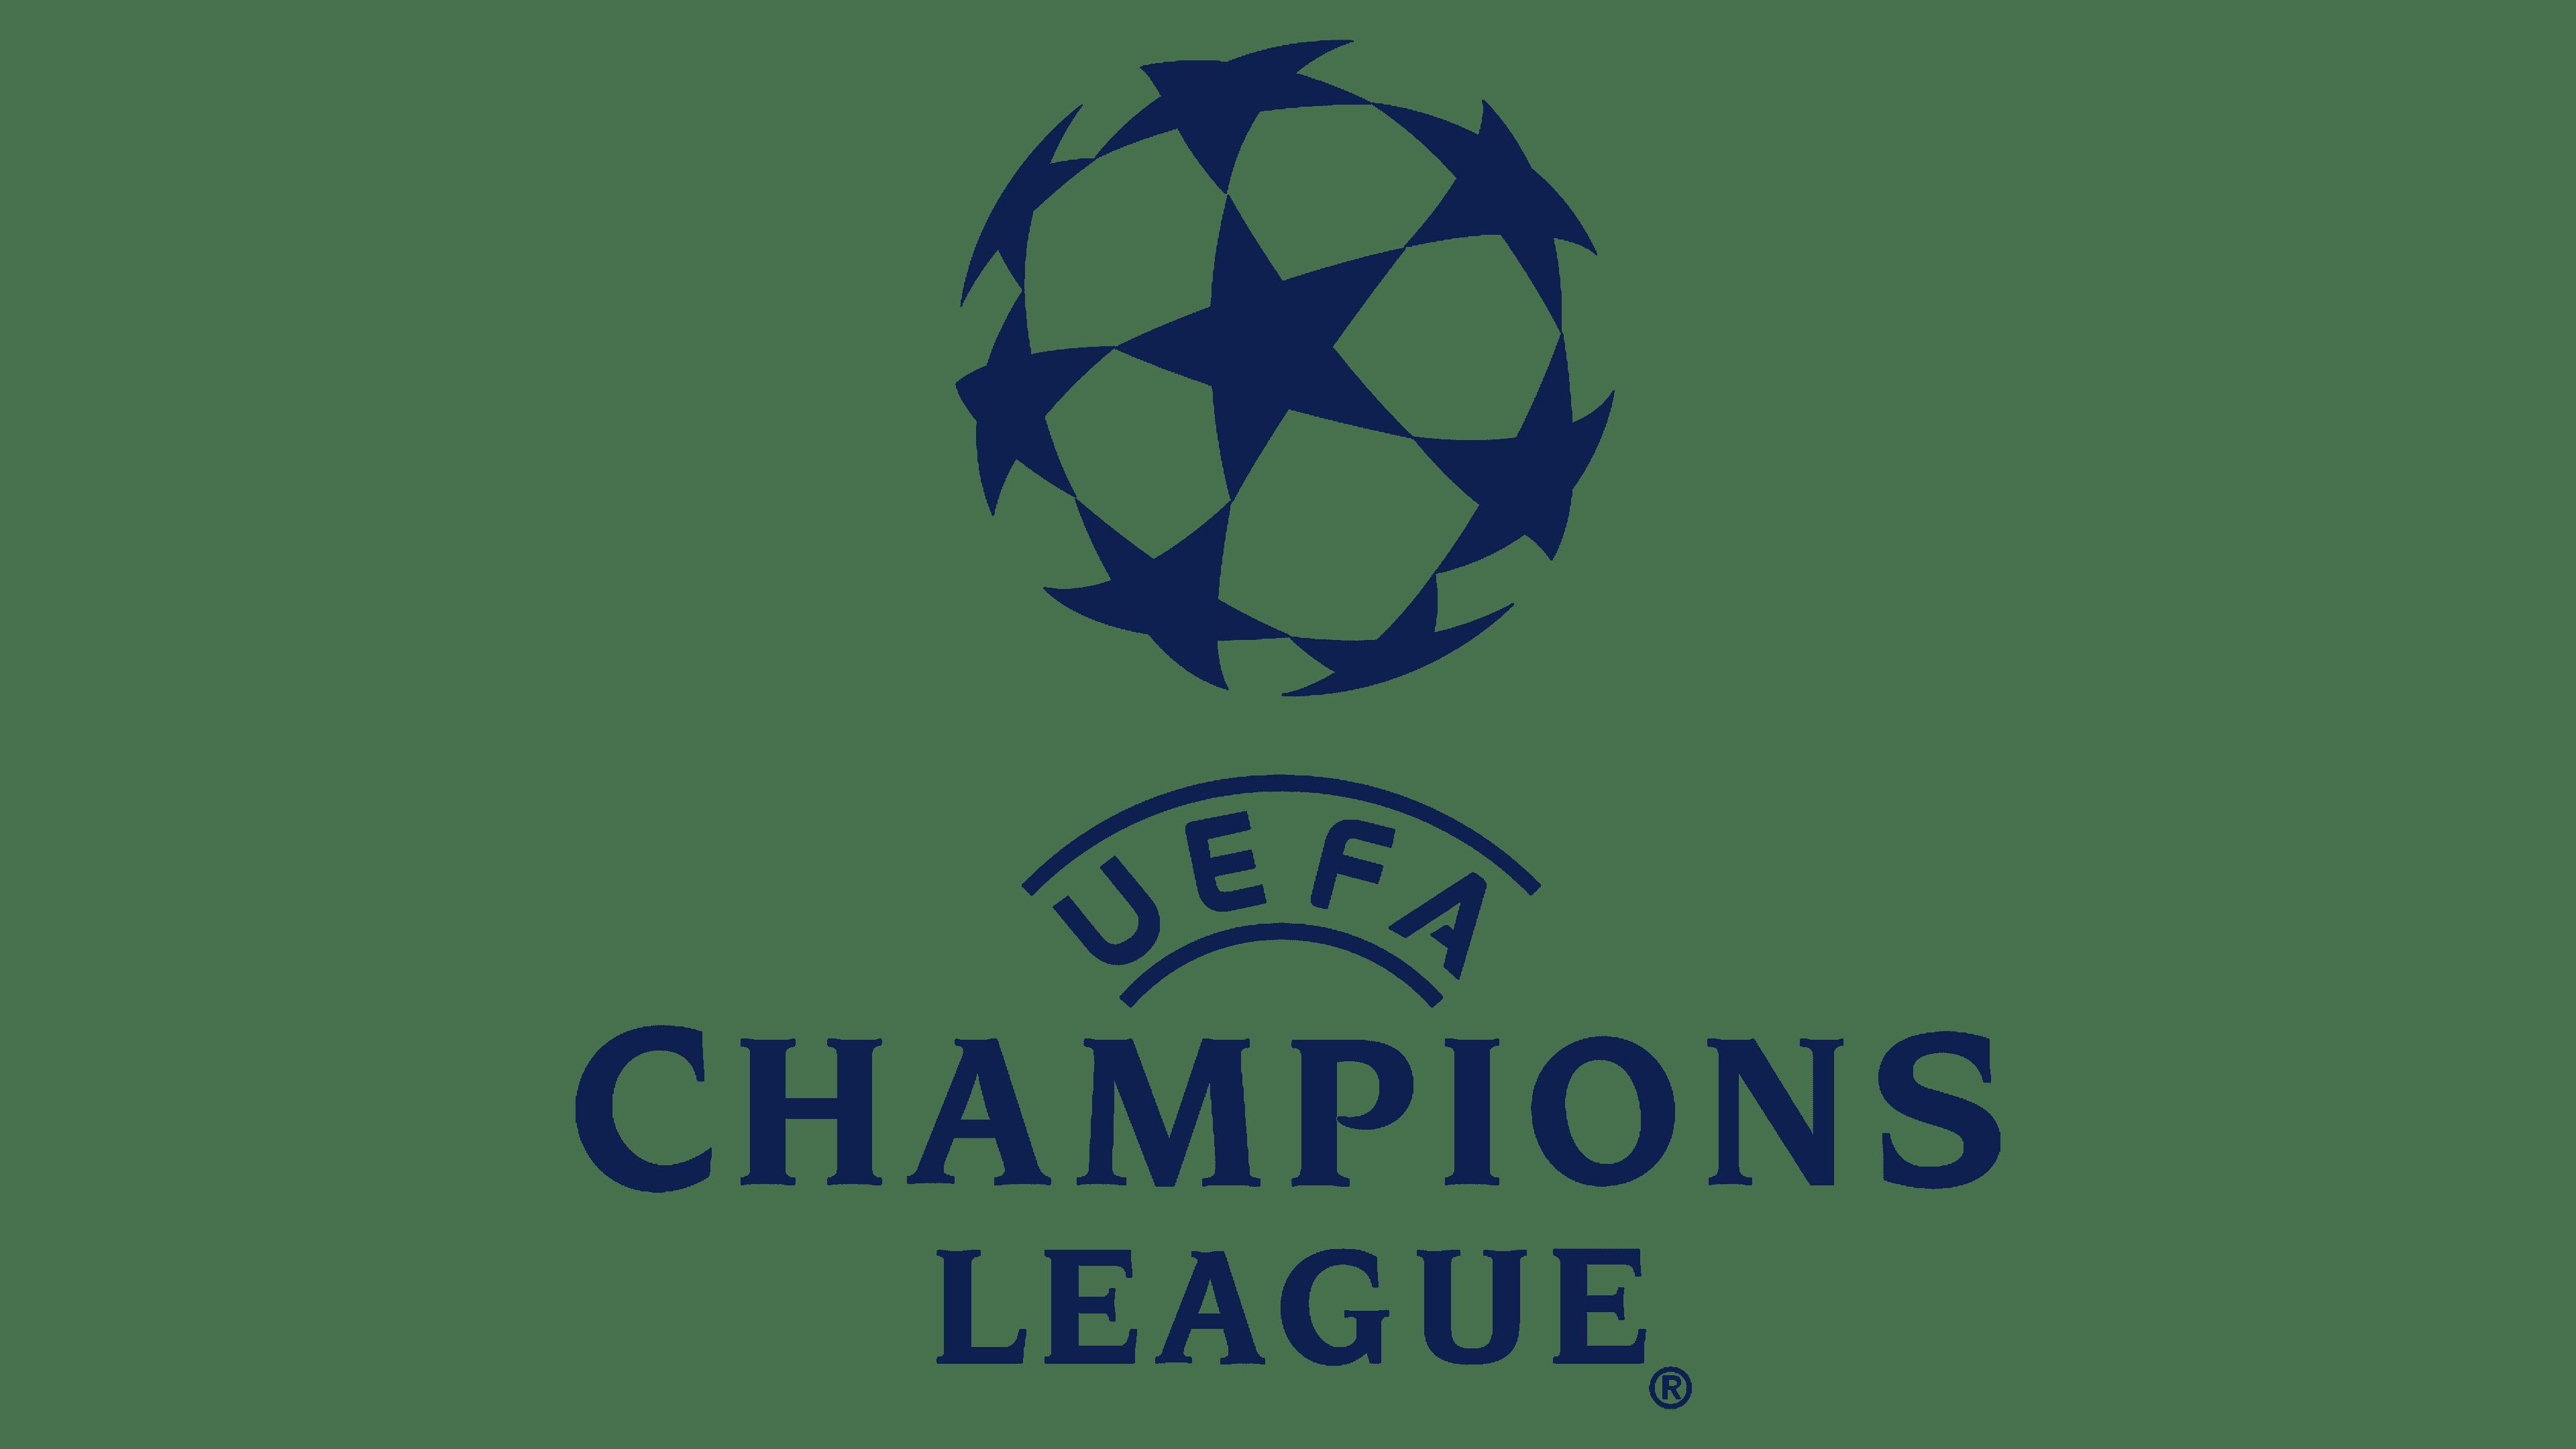 UEFA Champions League logo Logo